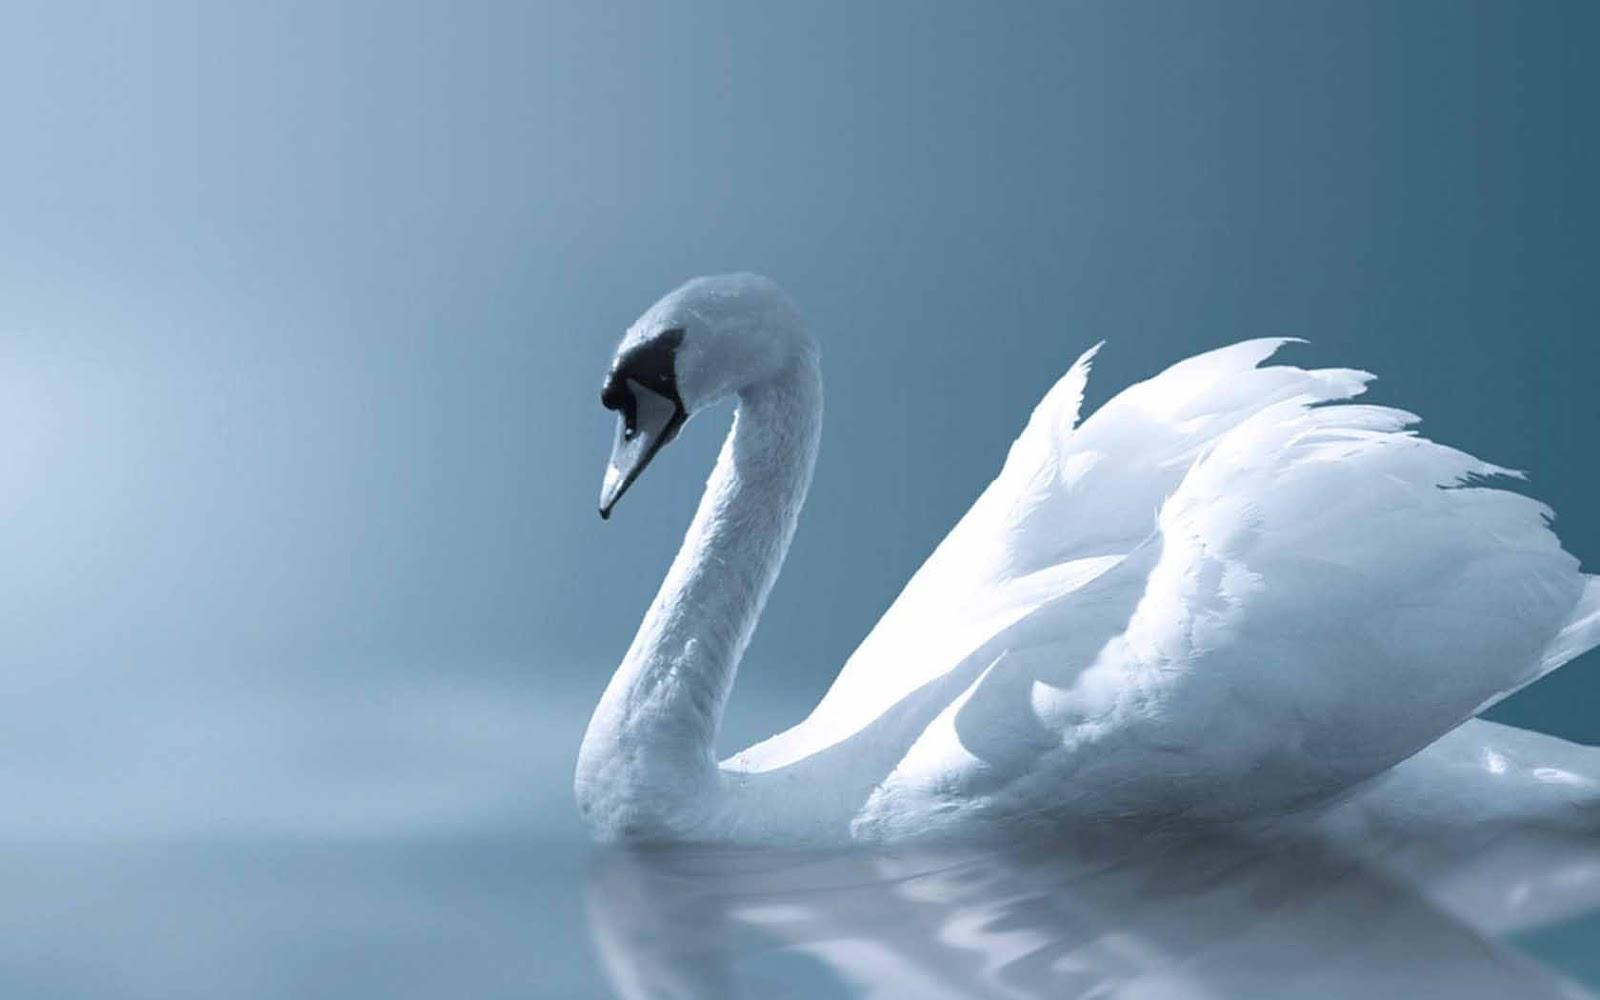 Hq wallpapers white swan wallpapers - Swan wallpapers for desktop ...